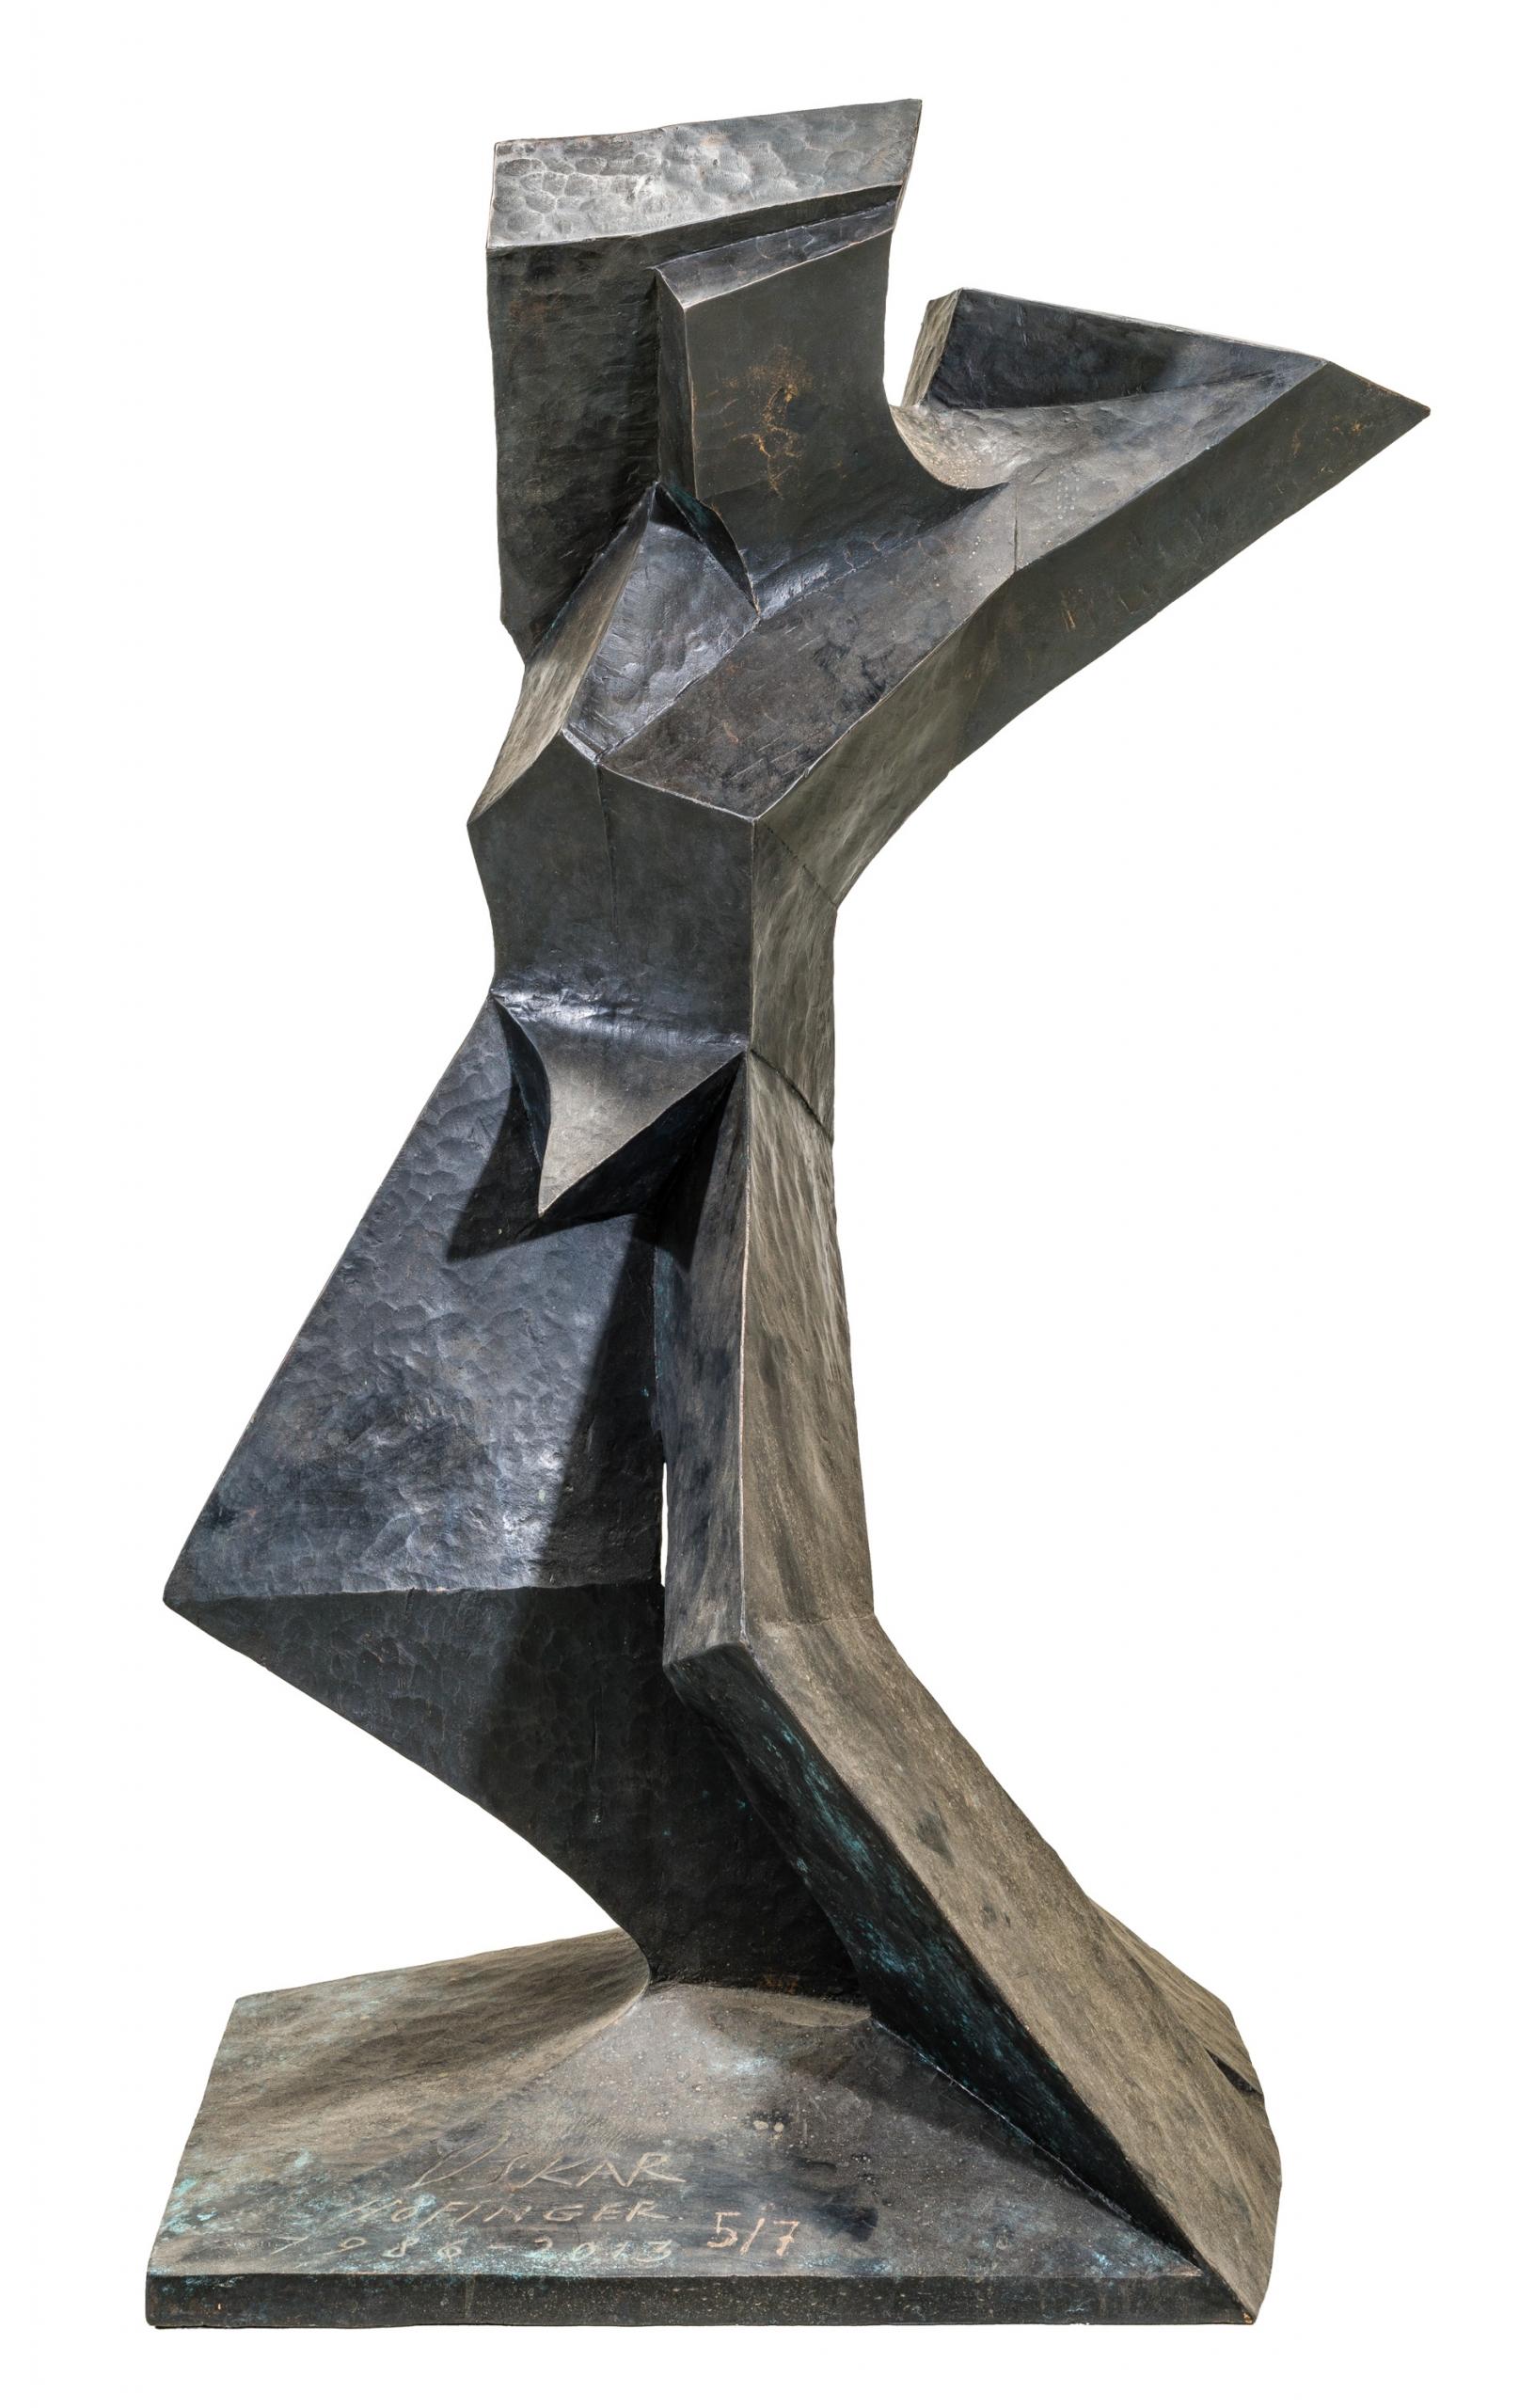 Oskar E. Höfinger, Erhebung